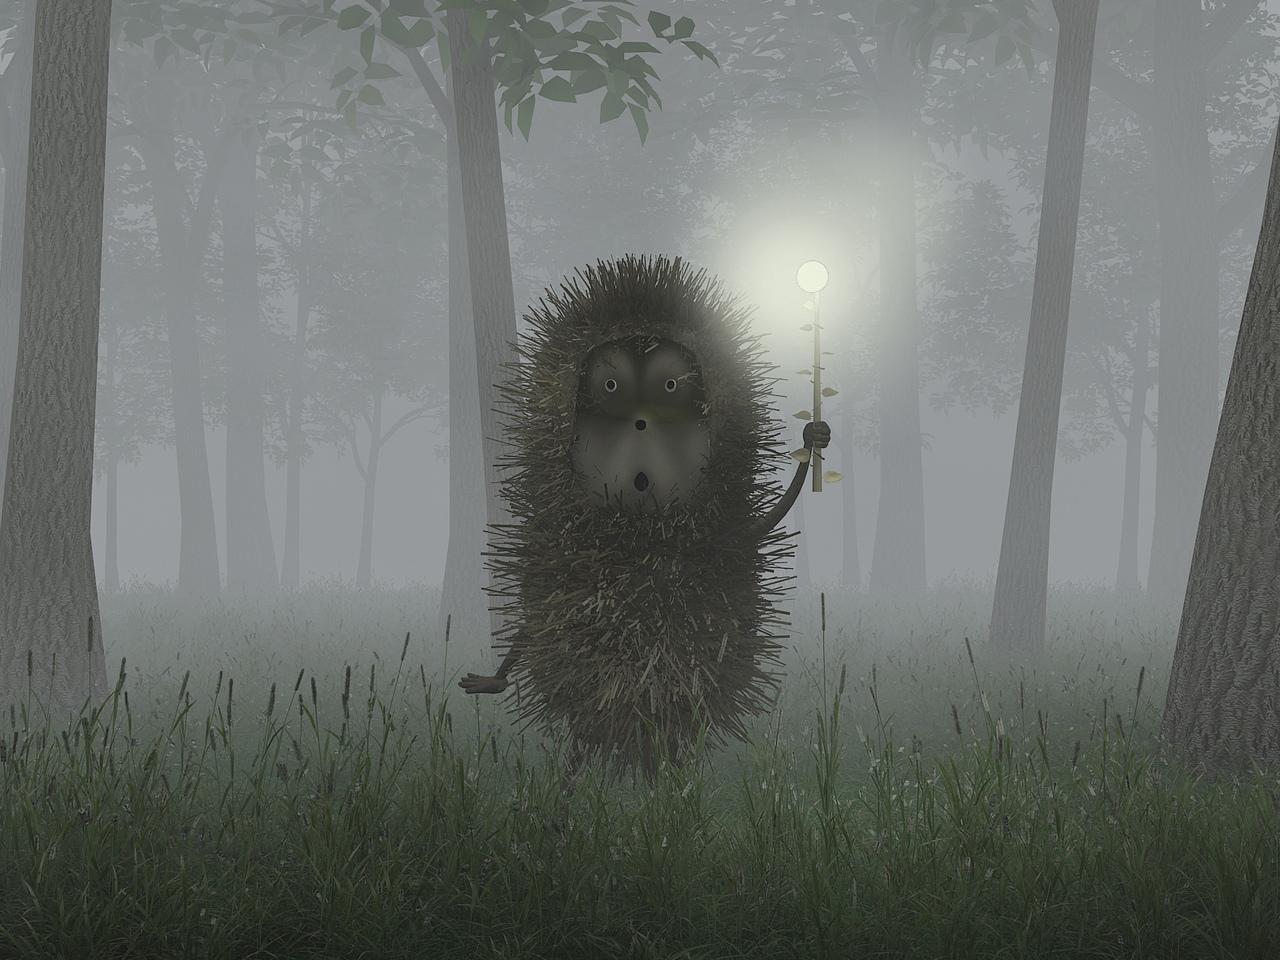 Кадр из мультфильма «Ёжик в тумане» (реж. Ю. Норштейн, 1975)